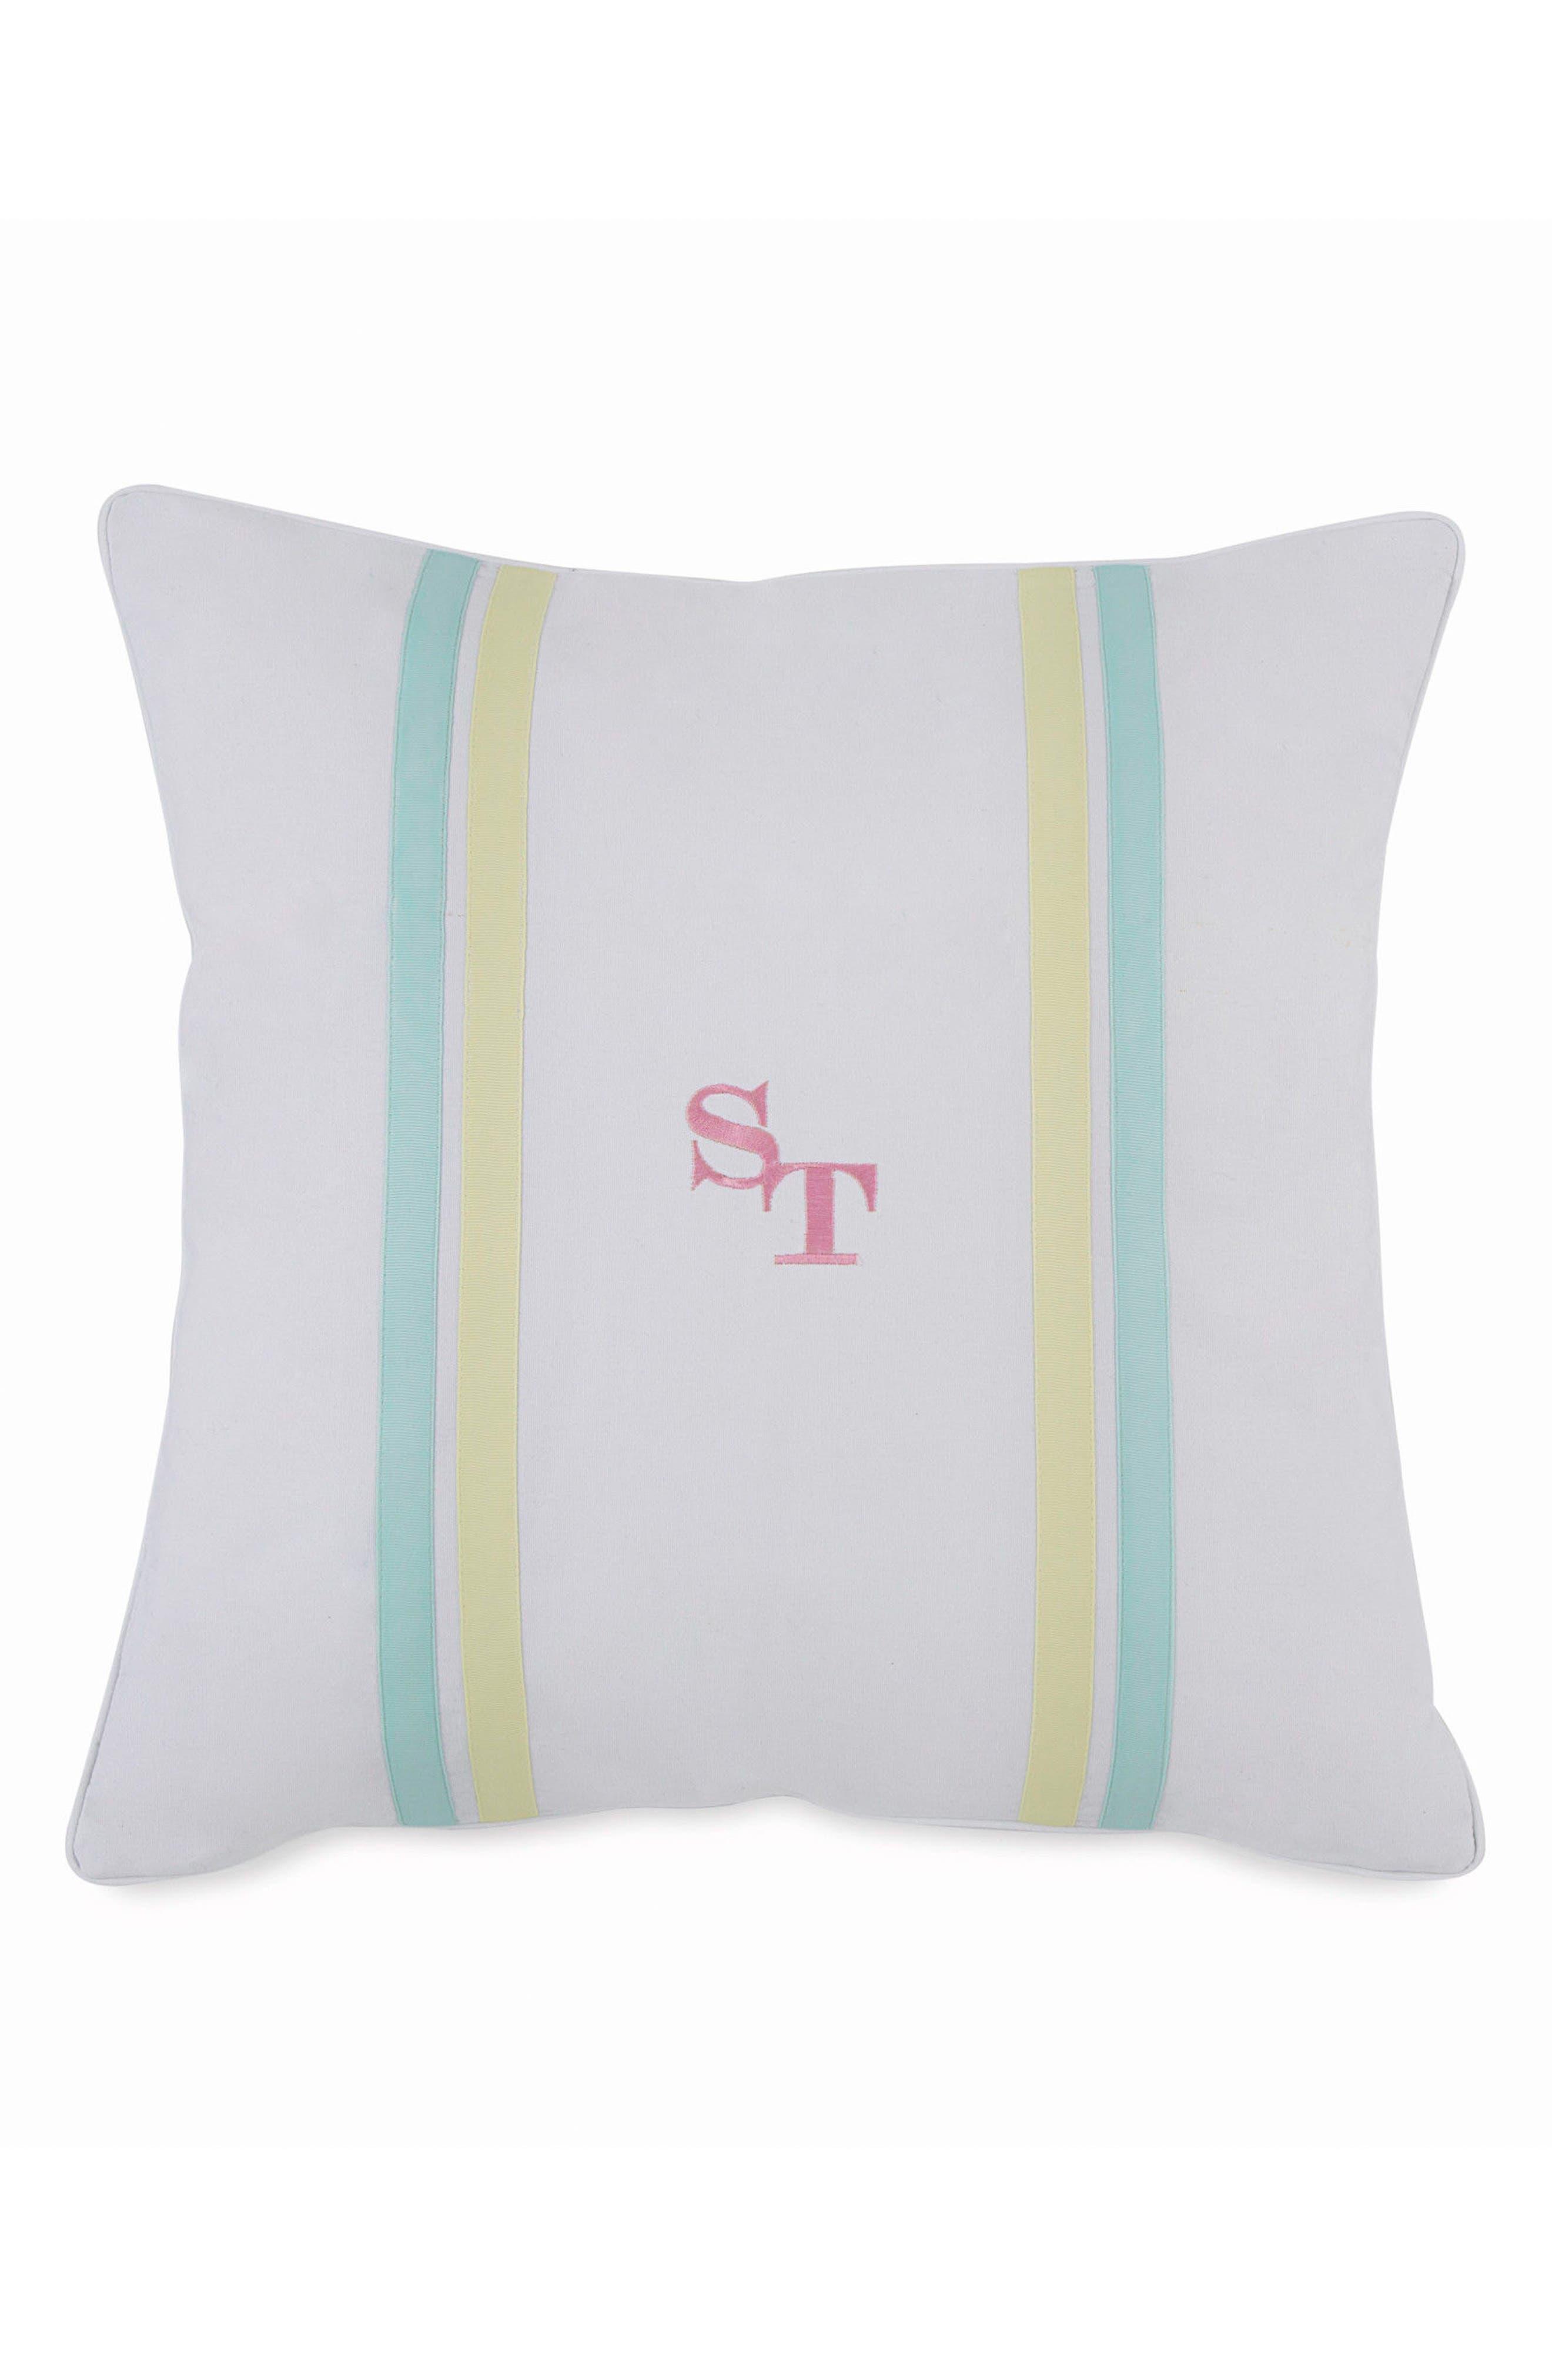 Tropical Retreat Accent Pillow,                         Main,                         color, White Multi